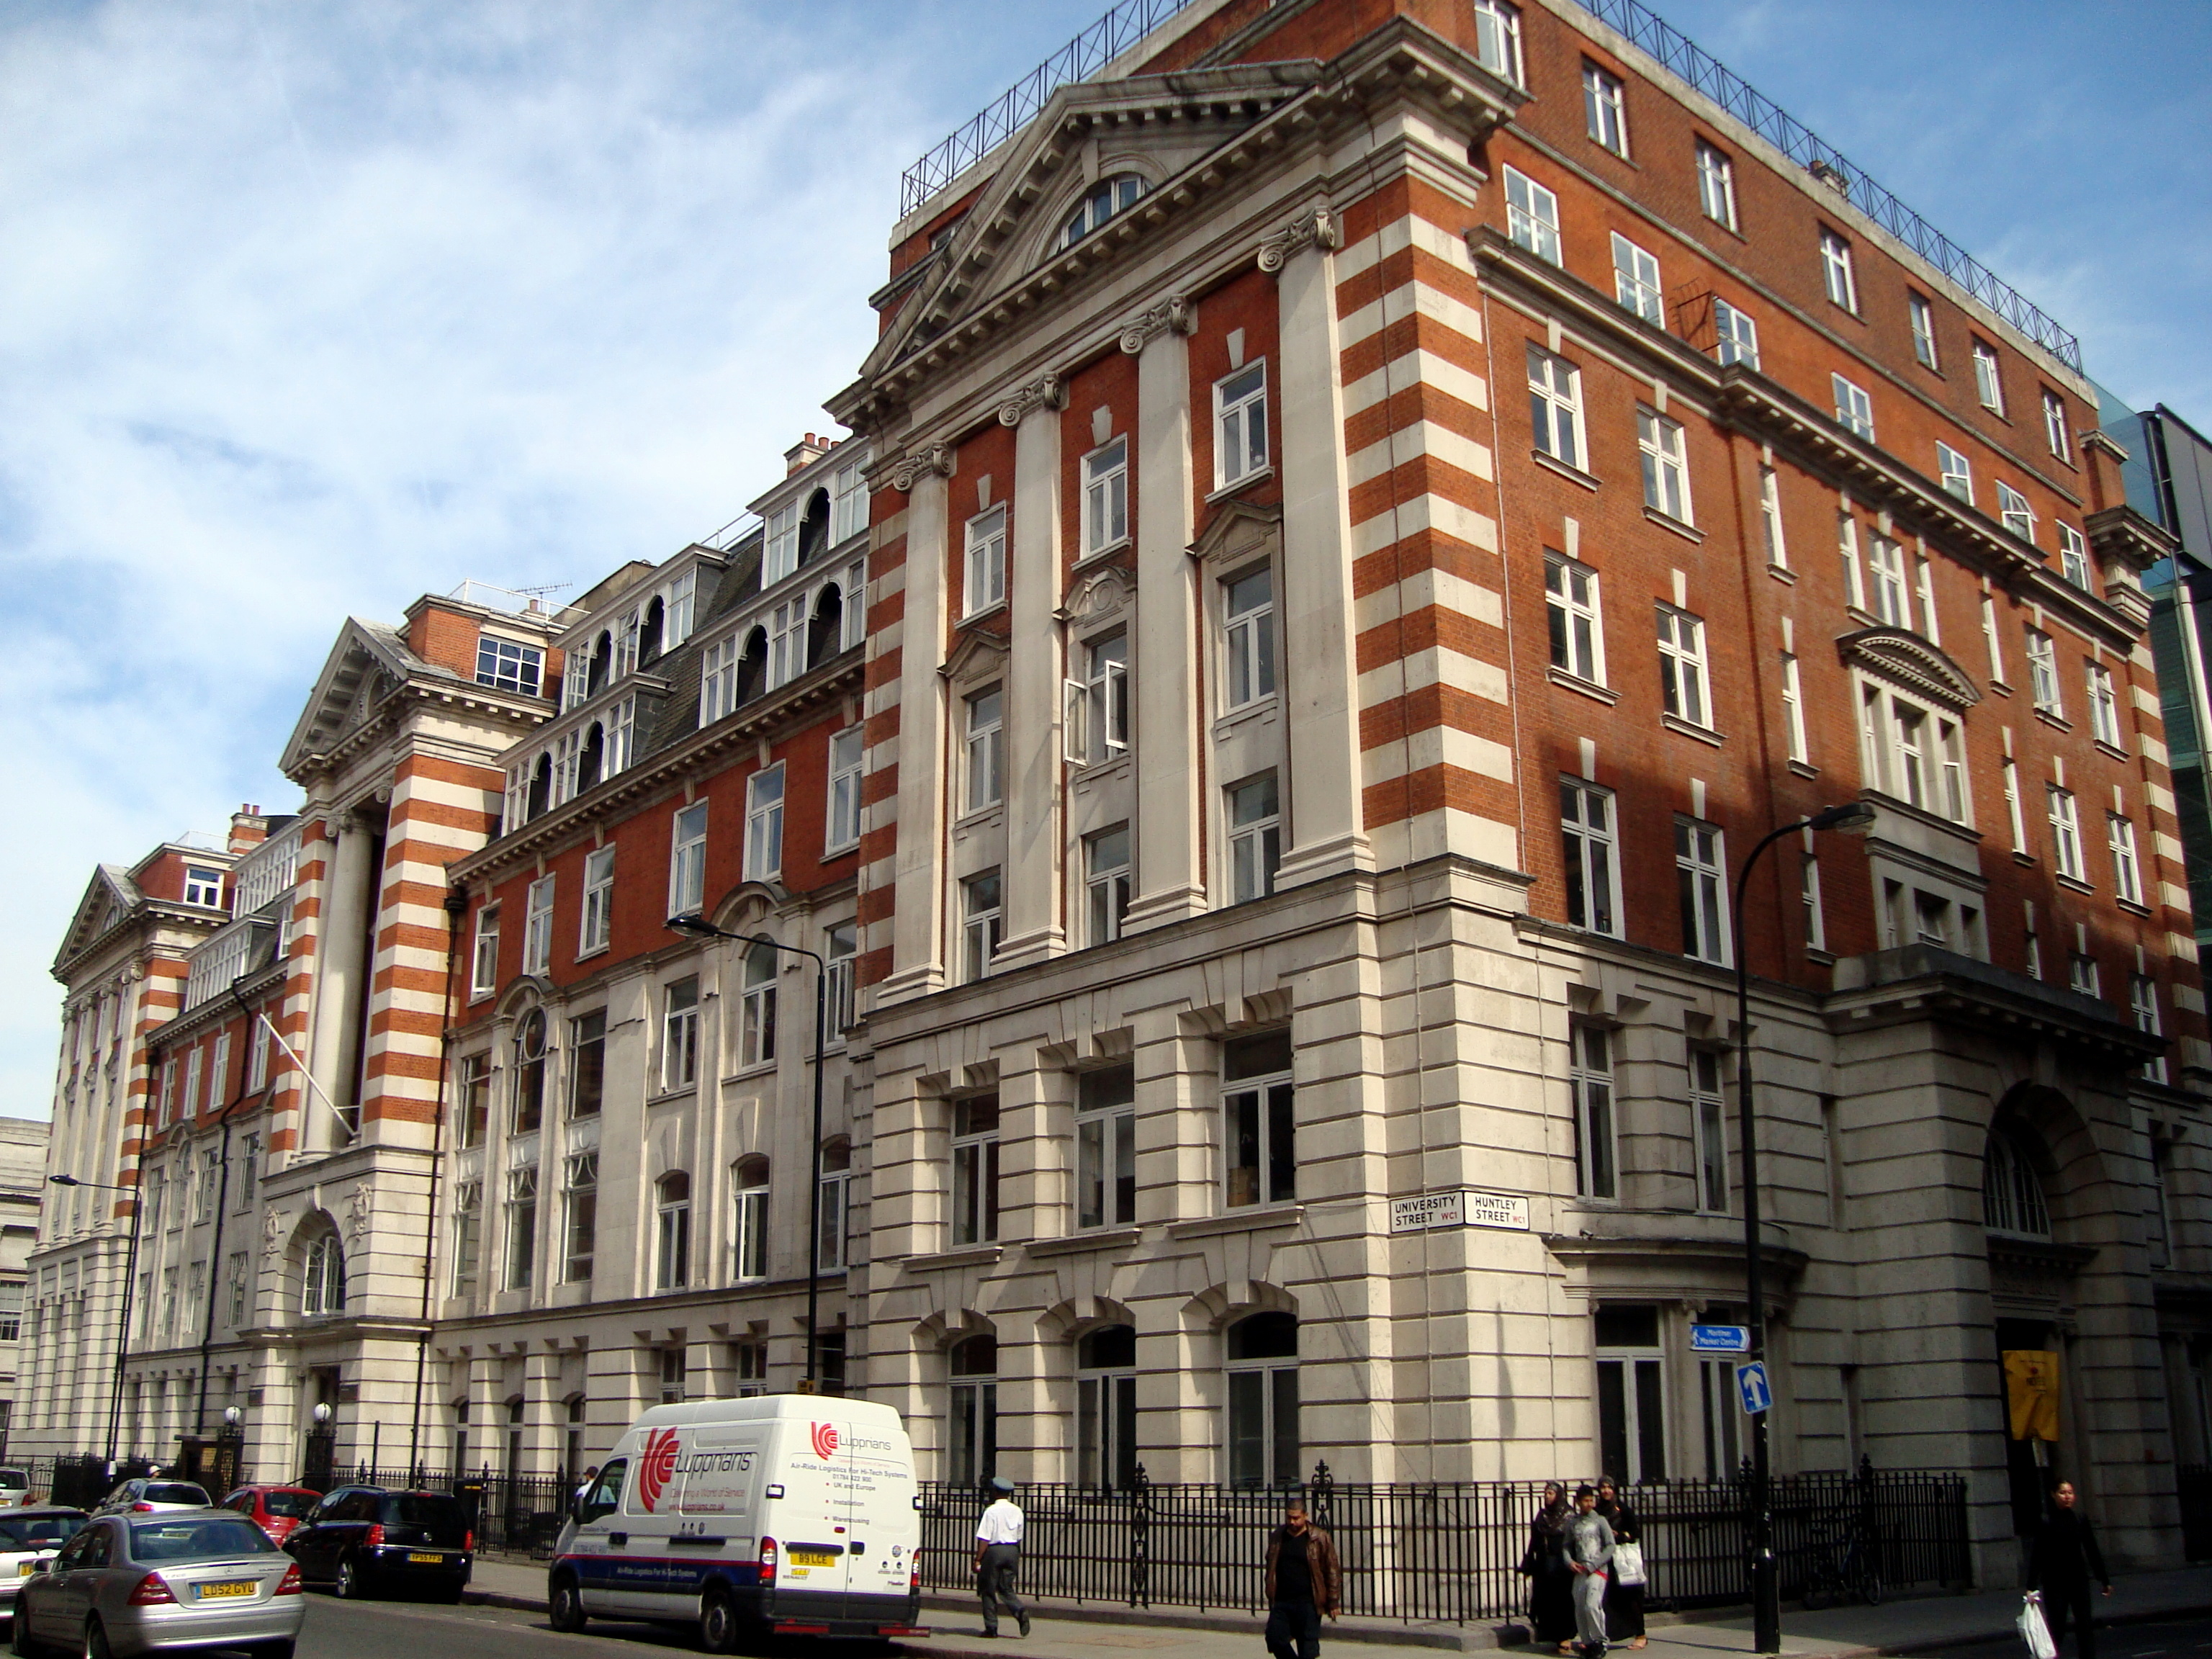 University Of London Union Building Borough